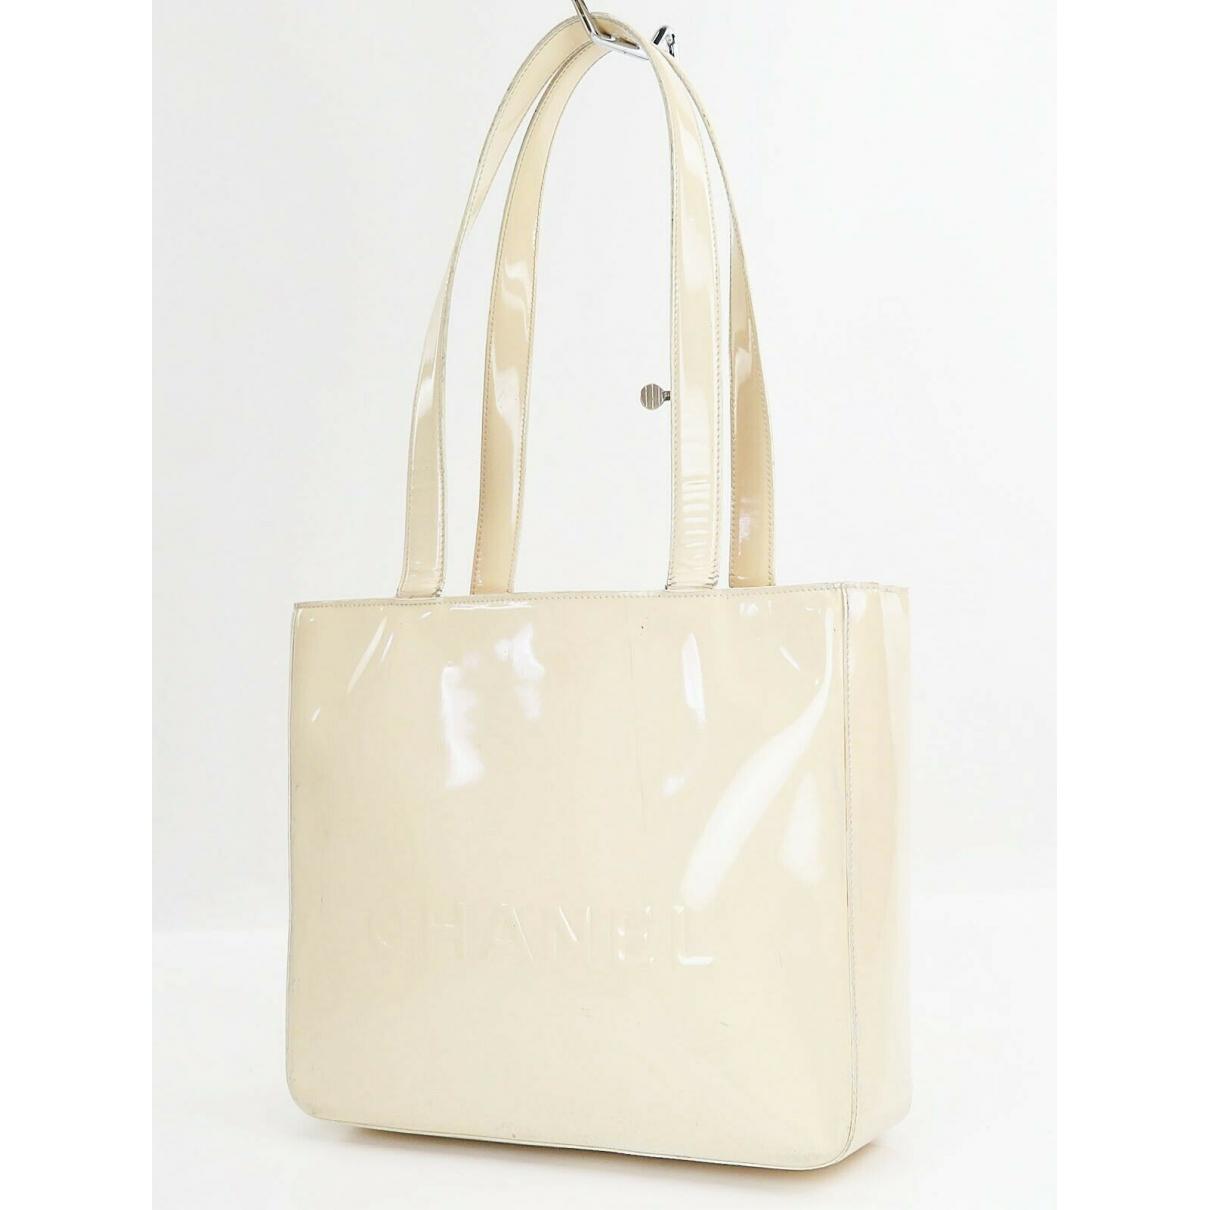 Chanel \N Patent leather handbag for Women \N